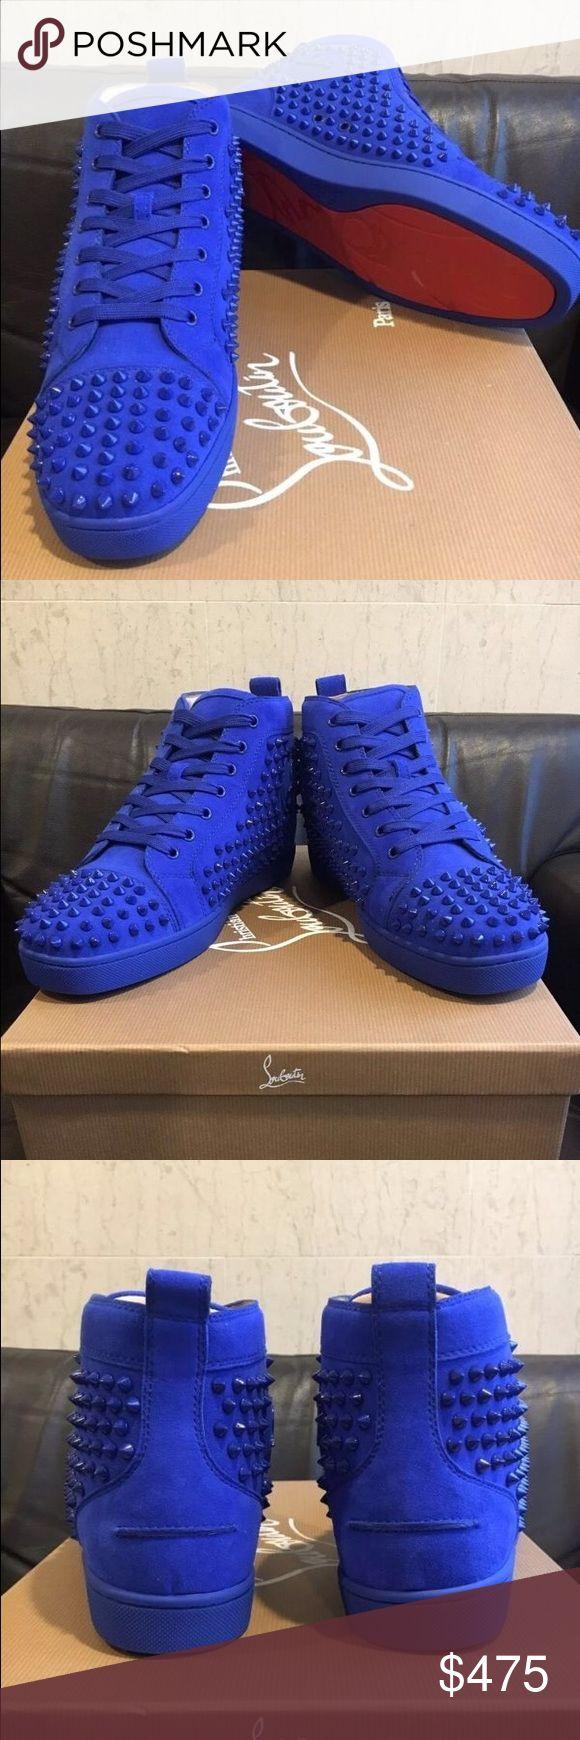 Men's Christian Louboutin Sneakers Brand new, bright and beautiful. Christian Louboutin Shoes Sneakers